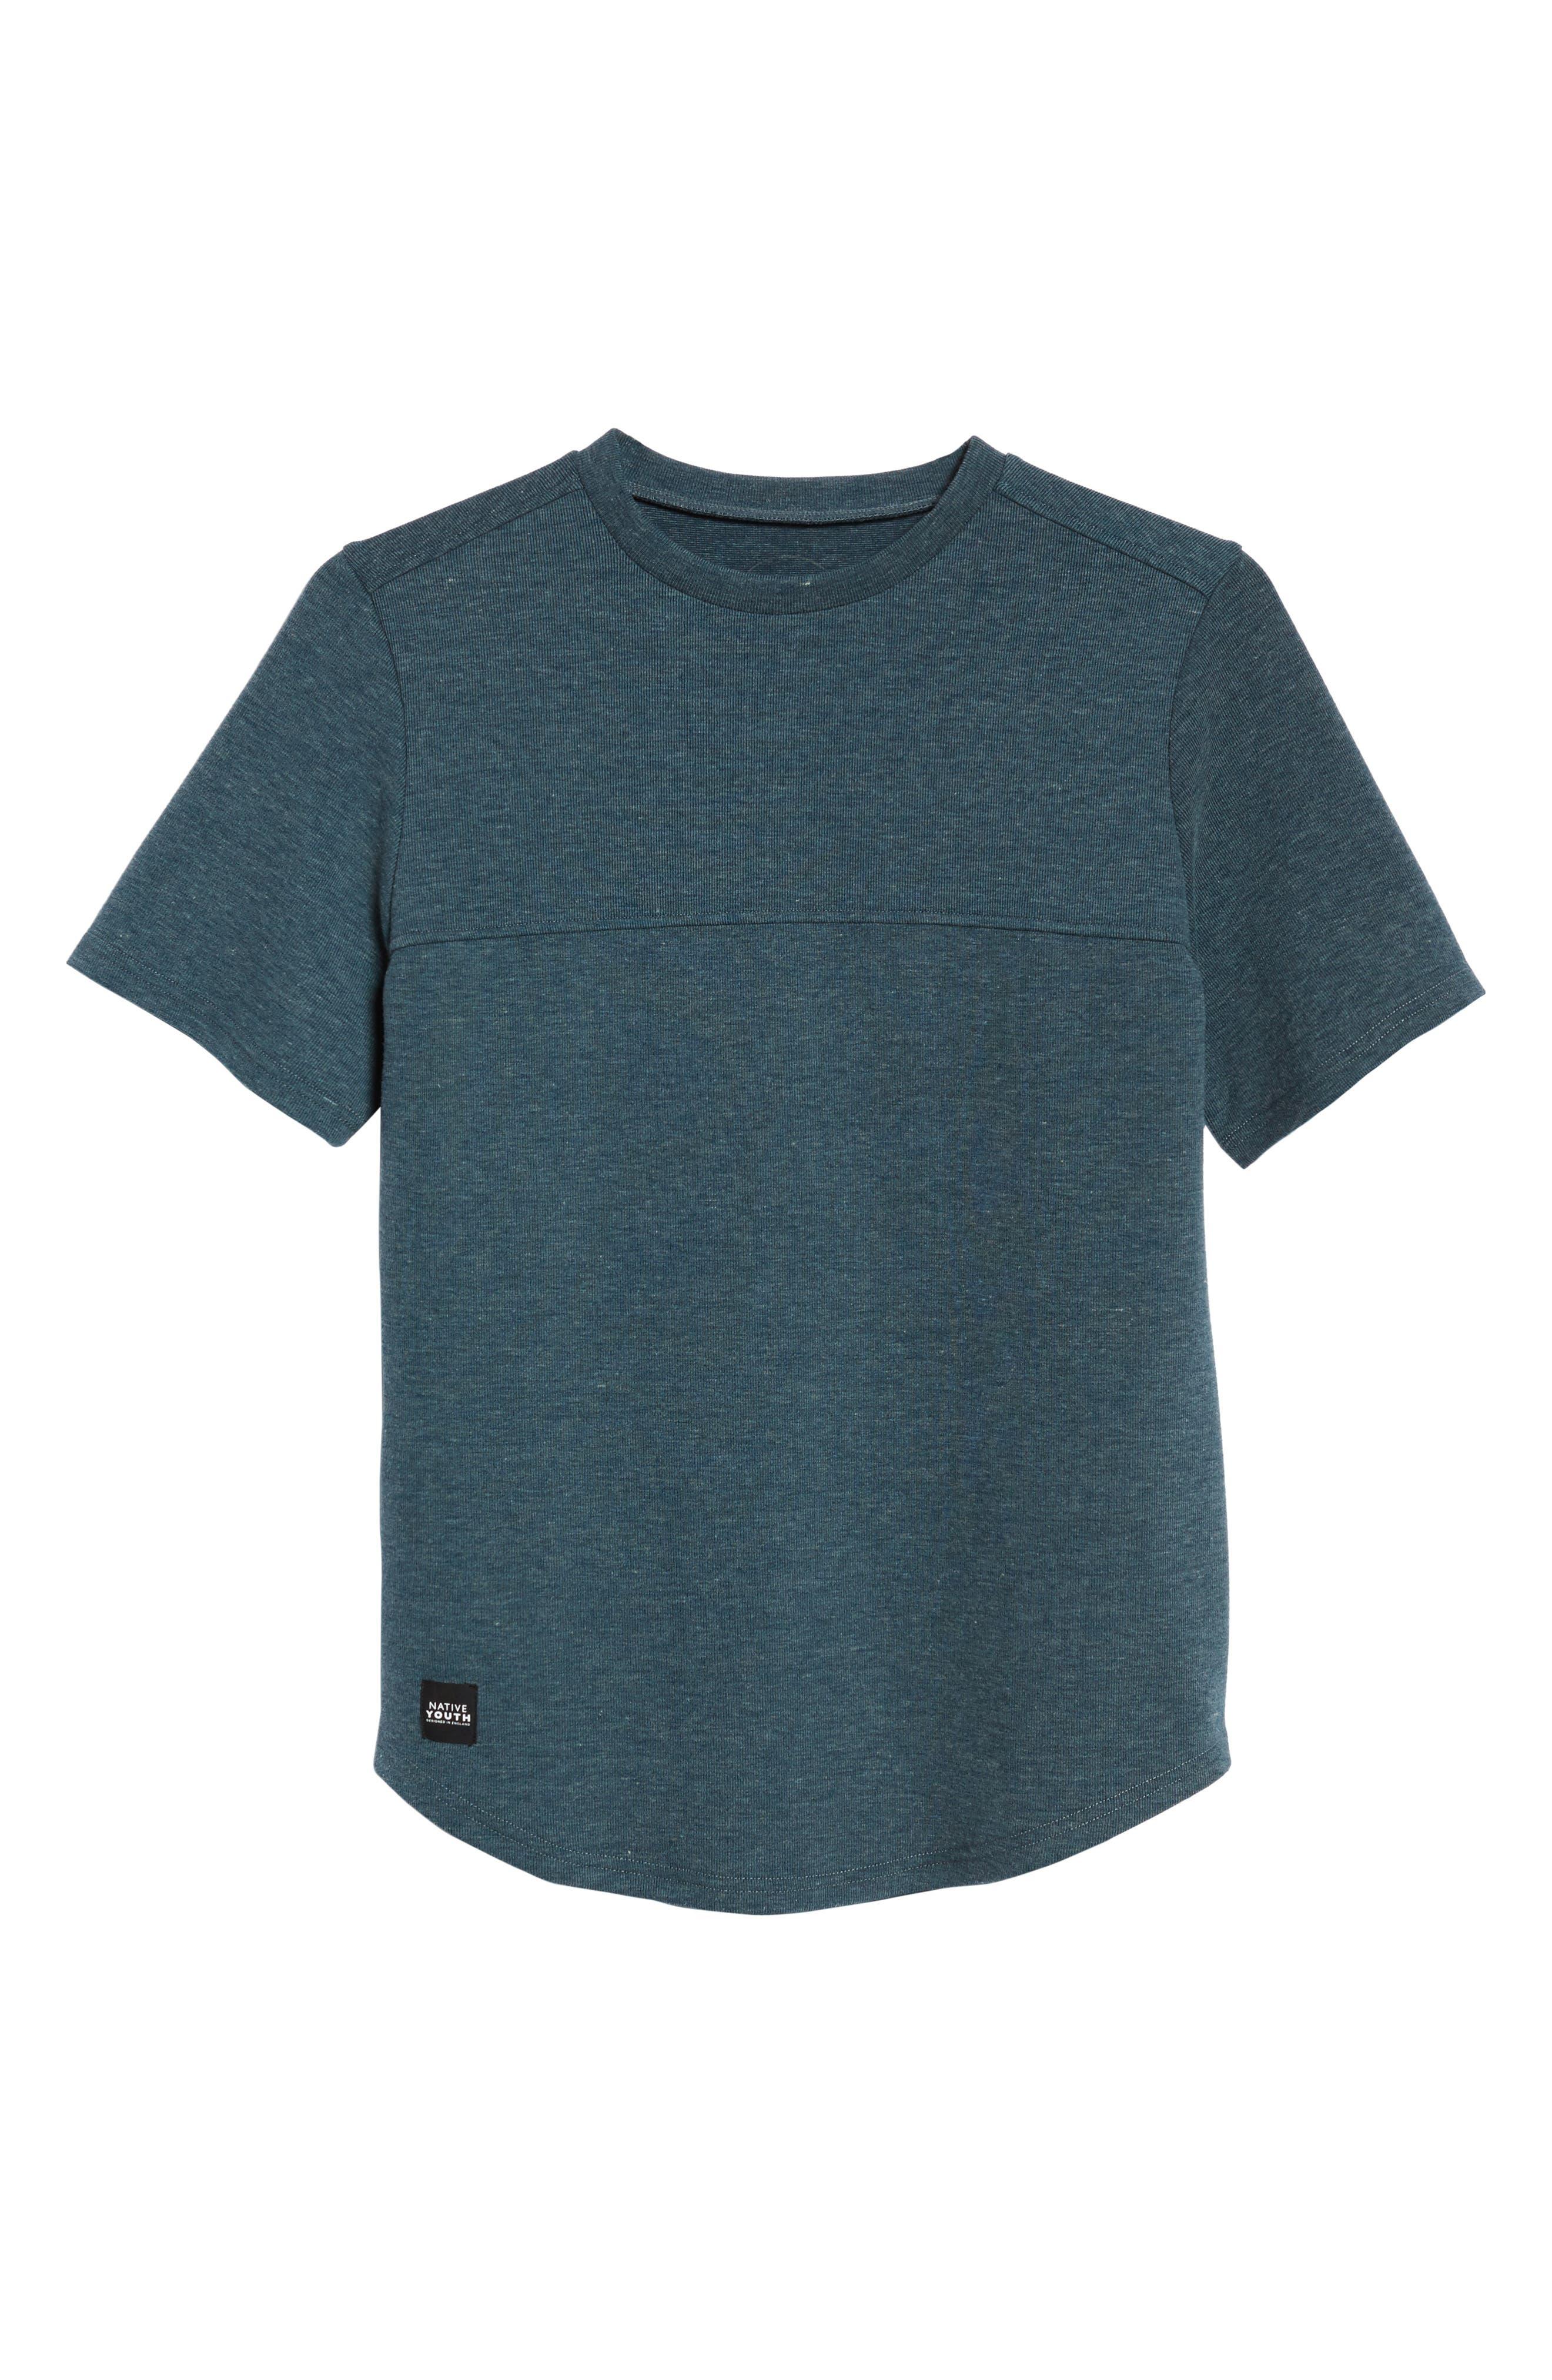 Onyx T-Shirt,                             Alternate thumbnail 6, color,                             Teal